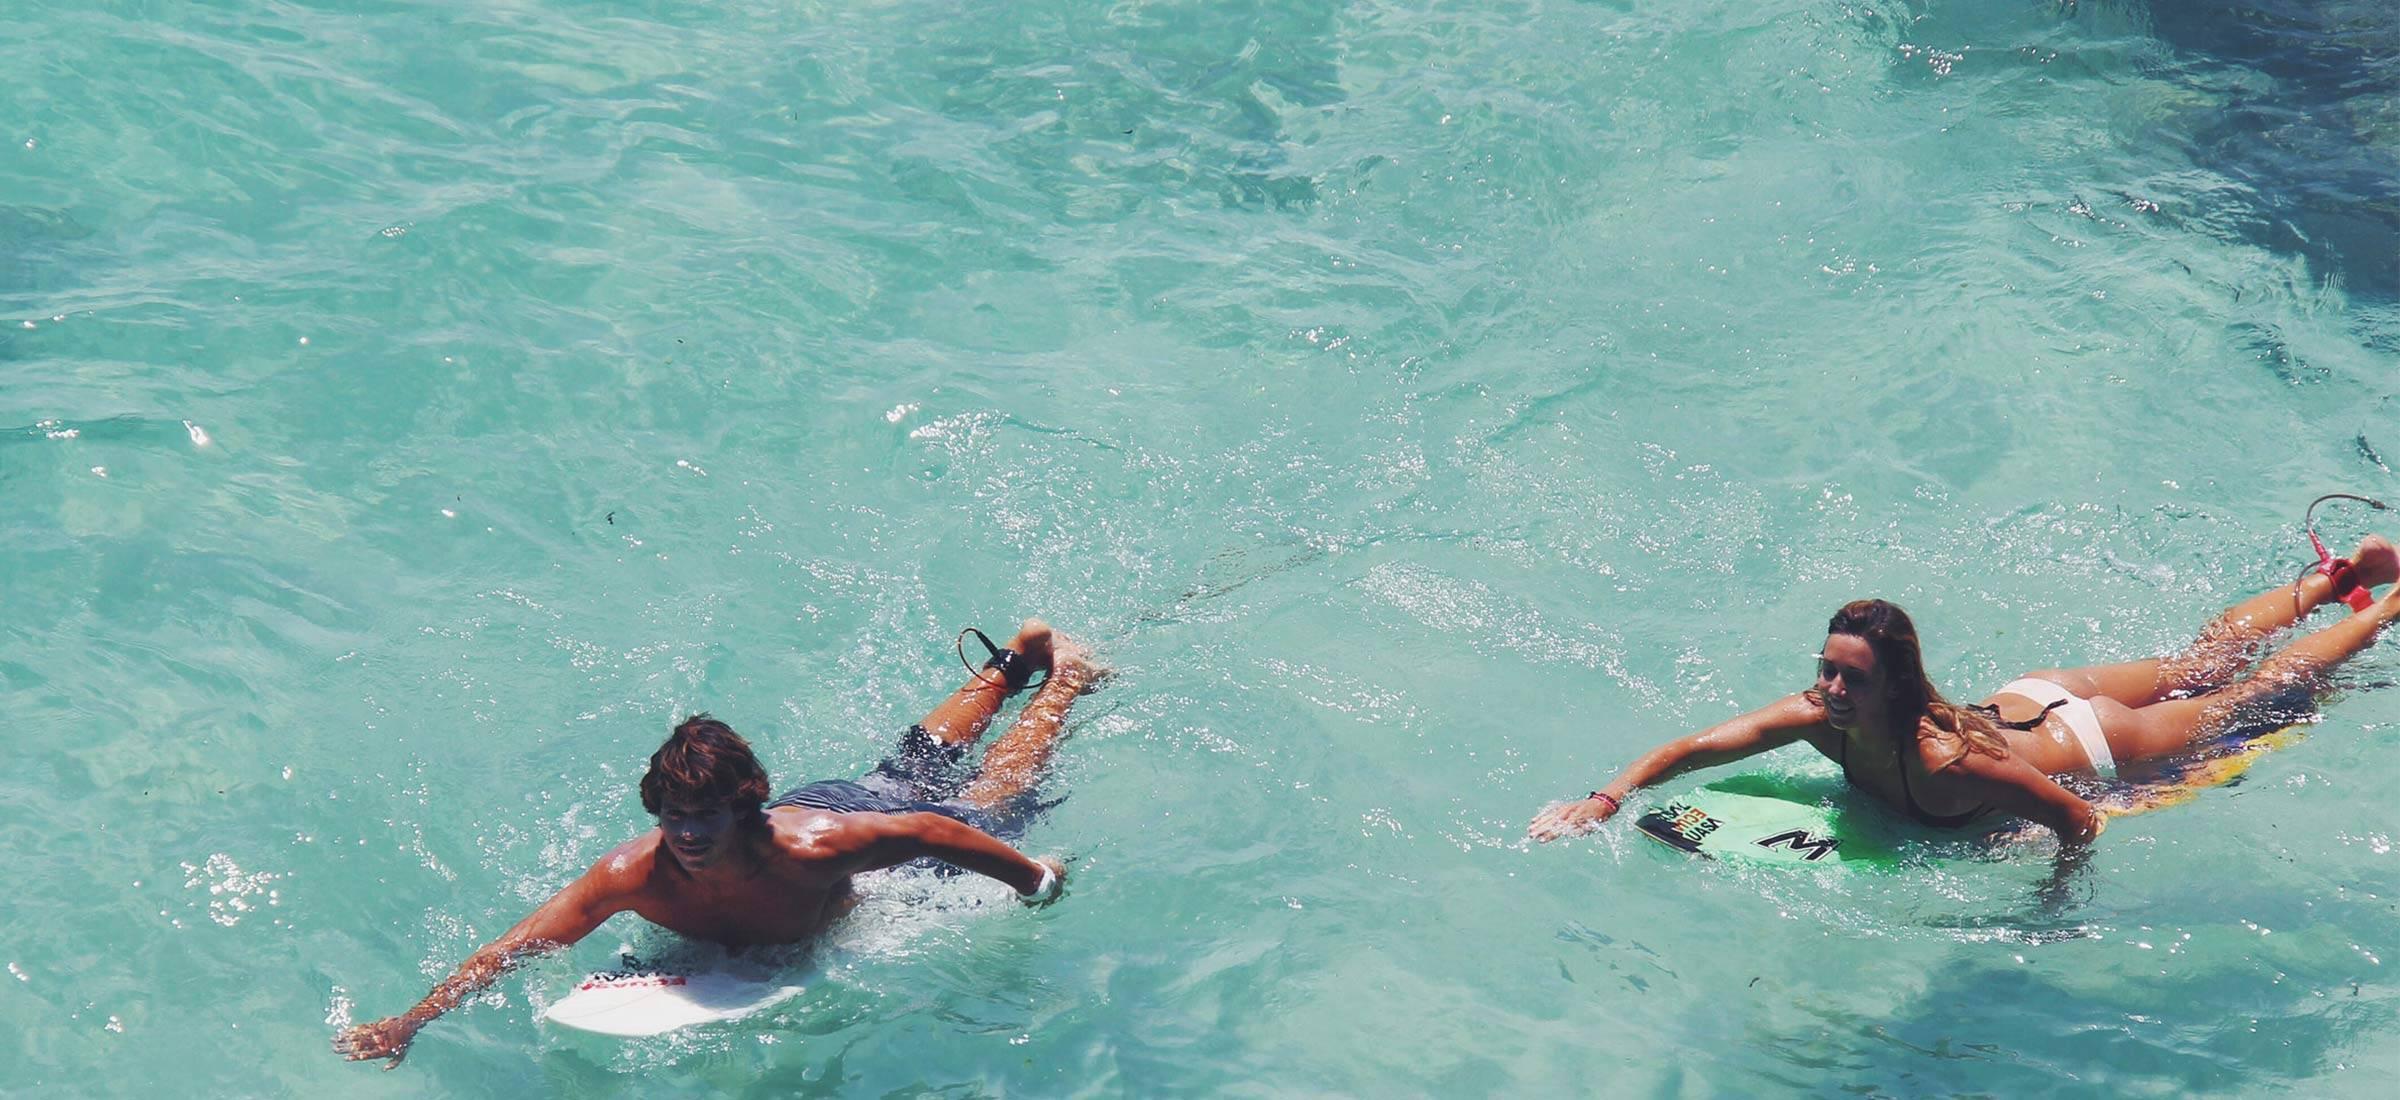 surf-girl-couple-uluwatu-bali